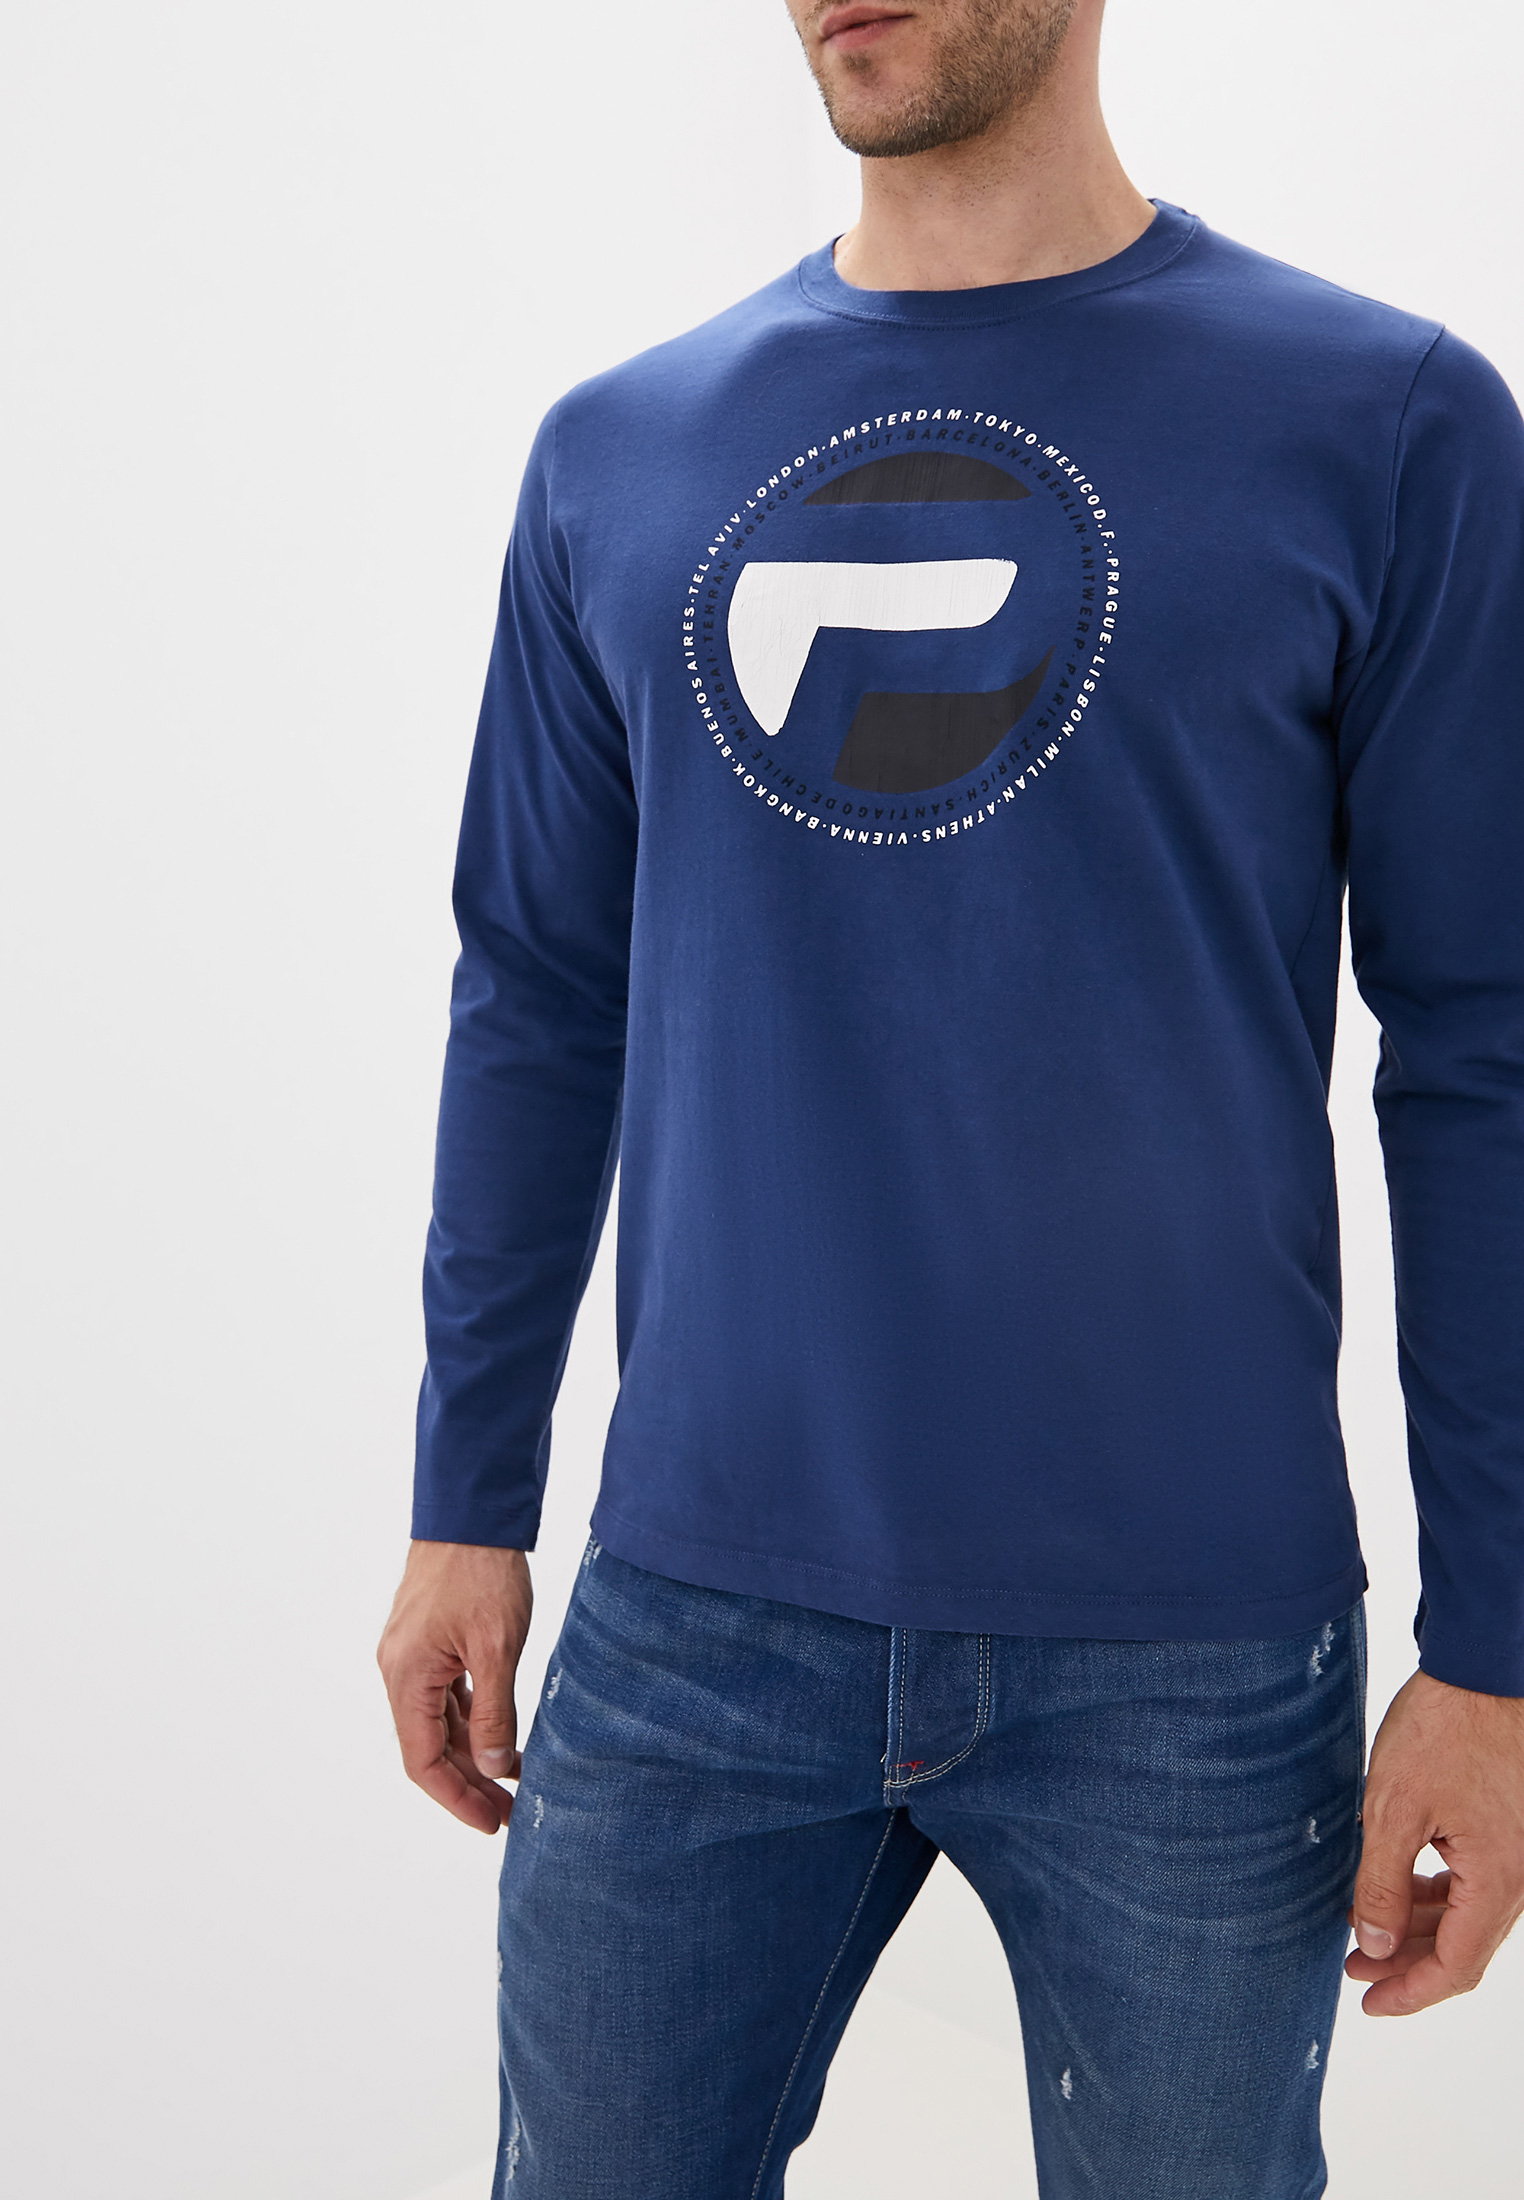 Футболка с длинным рукавом Pepe Jeans (Пепе Джинс) PM506549